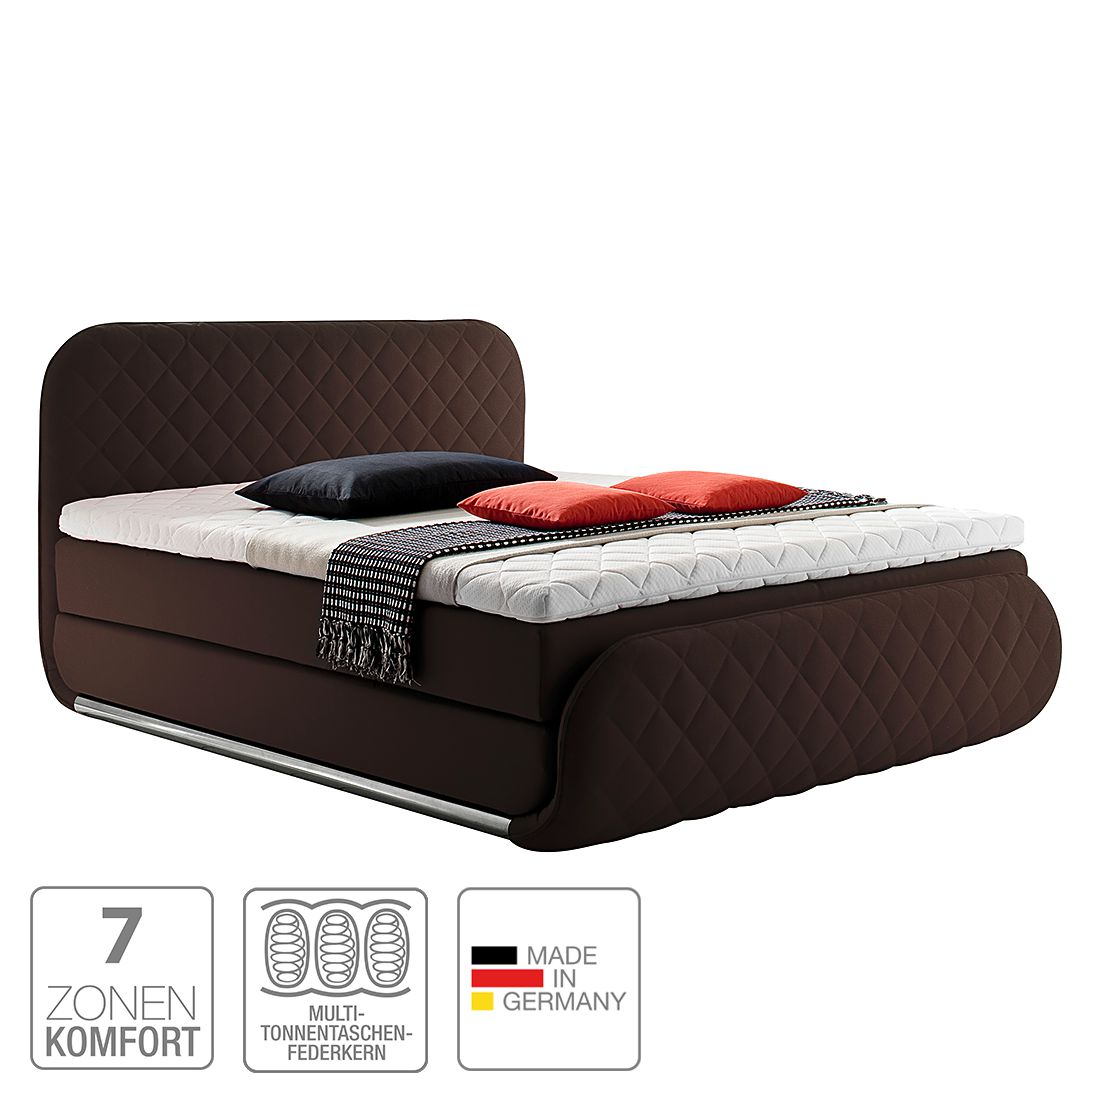 boxspringbett casario webstoff h2 bis 80 kg h3 ab 80 kg viscoschaumtopper. Black Bedroom Furniture Sets. Home Design Ideas